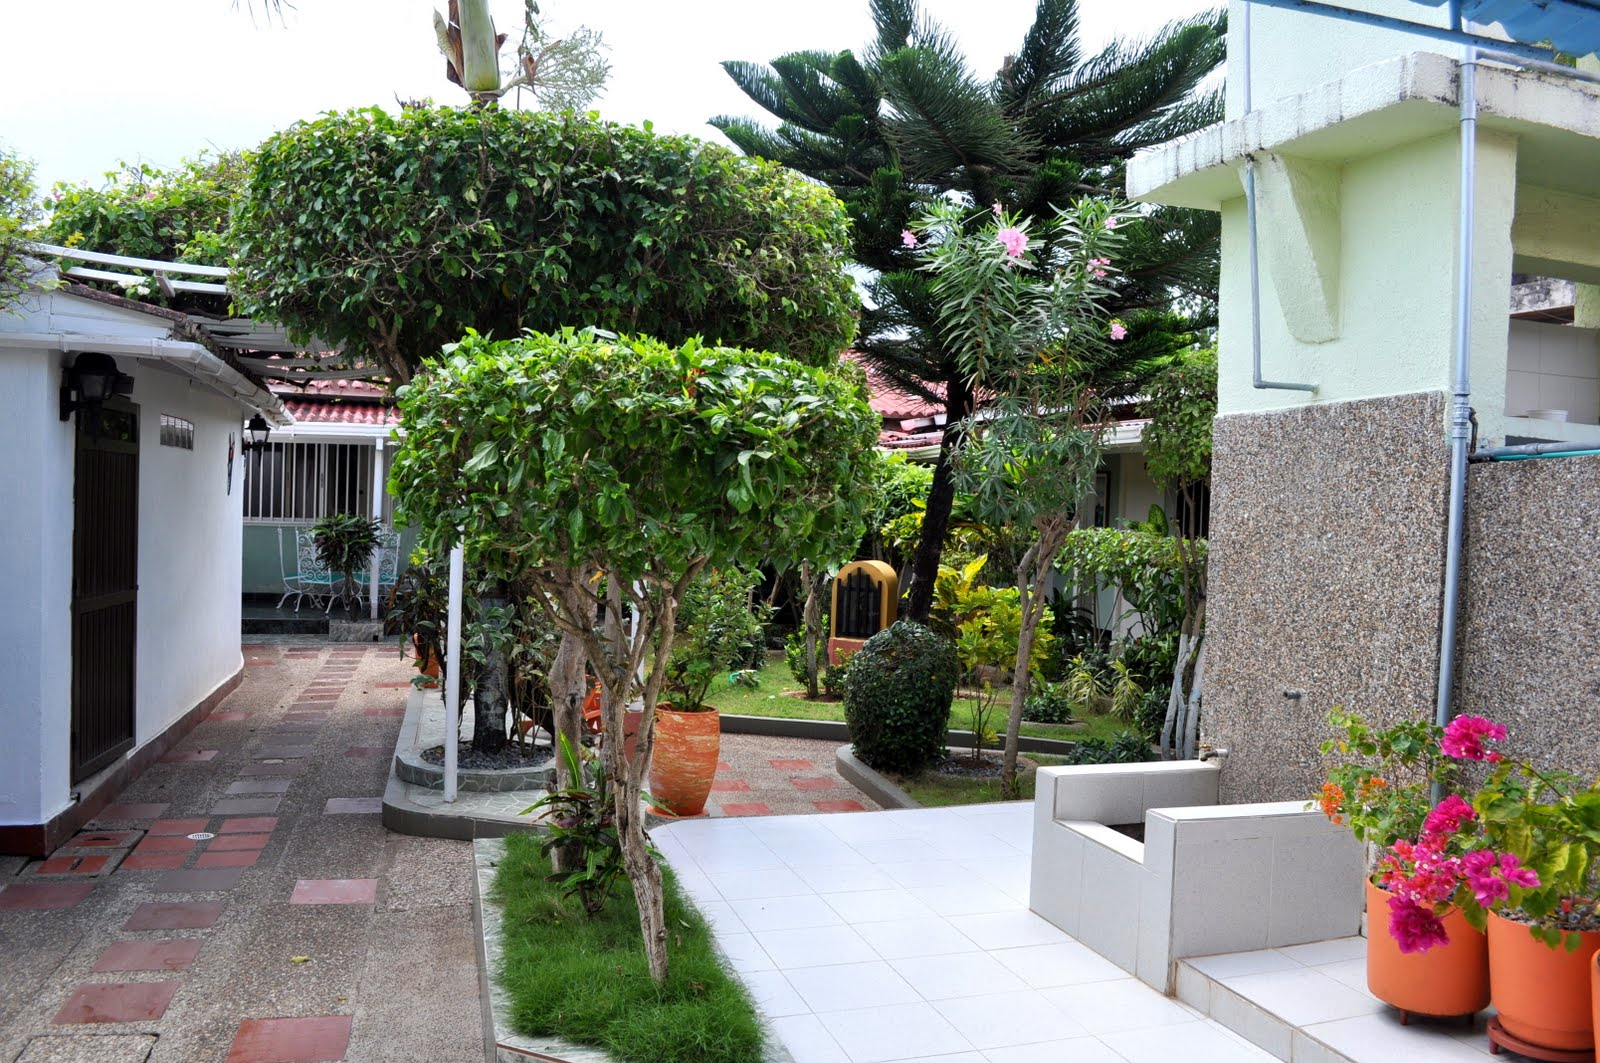 Residencia hostal omaira torres for Hostal ciudad jardin